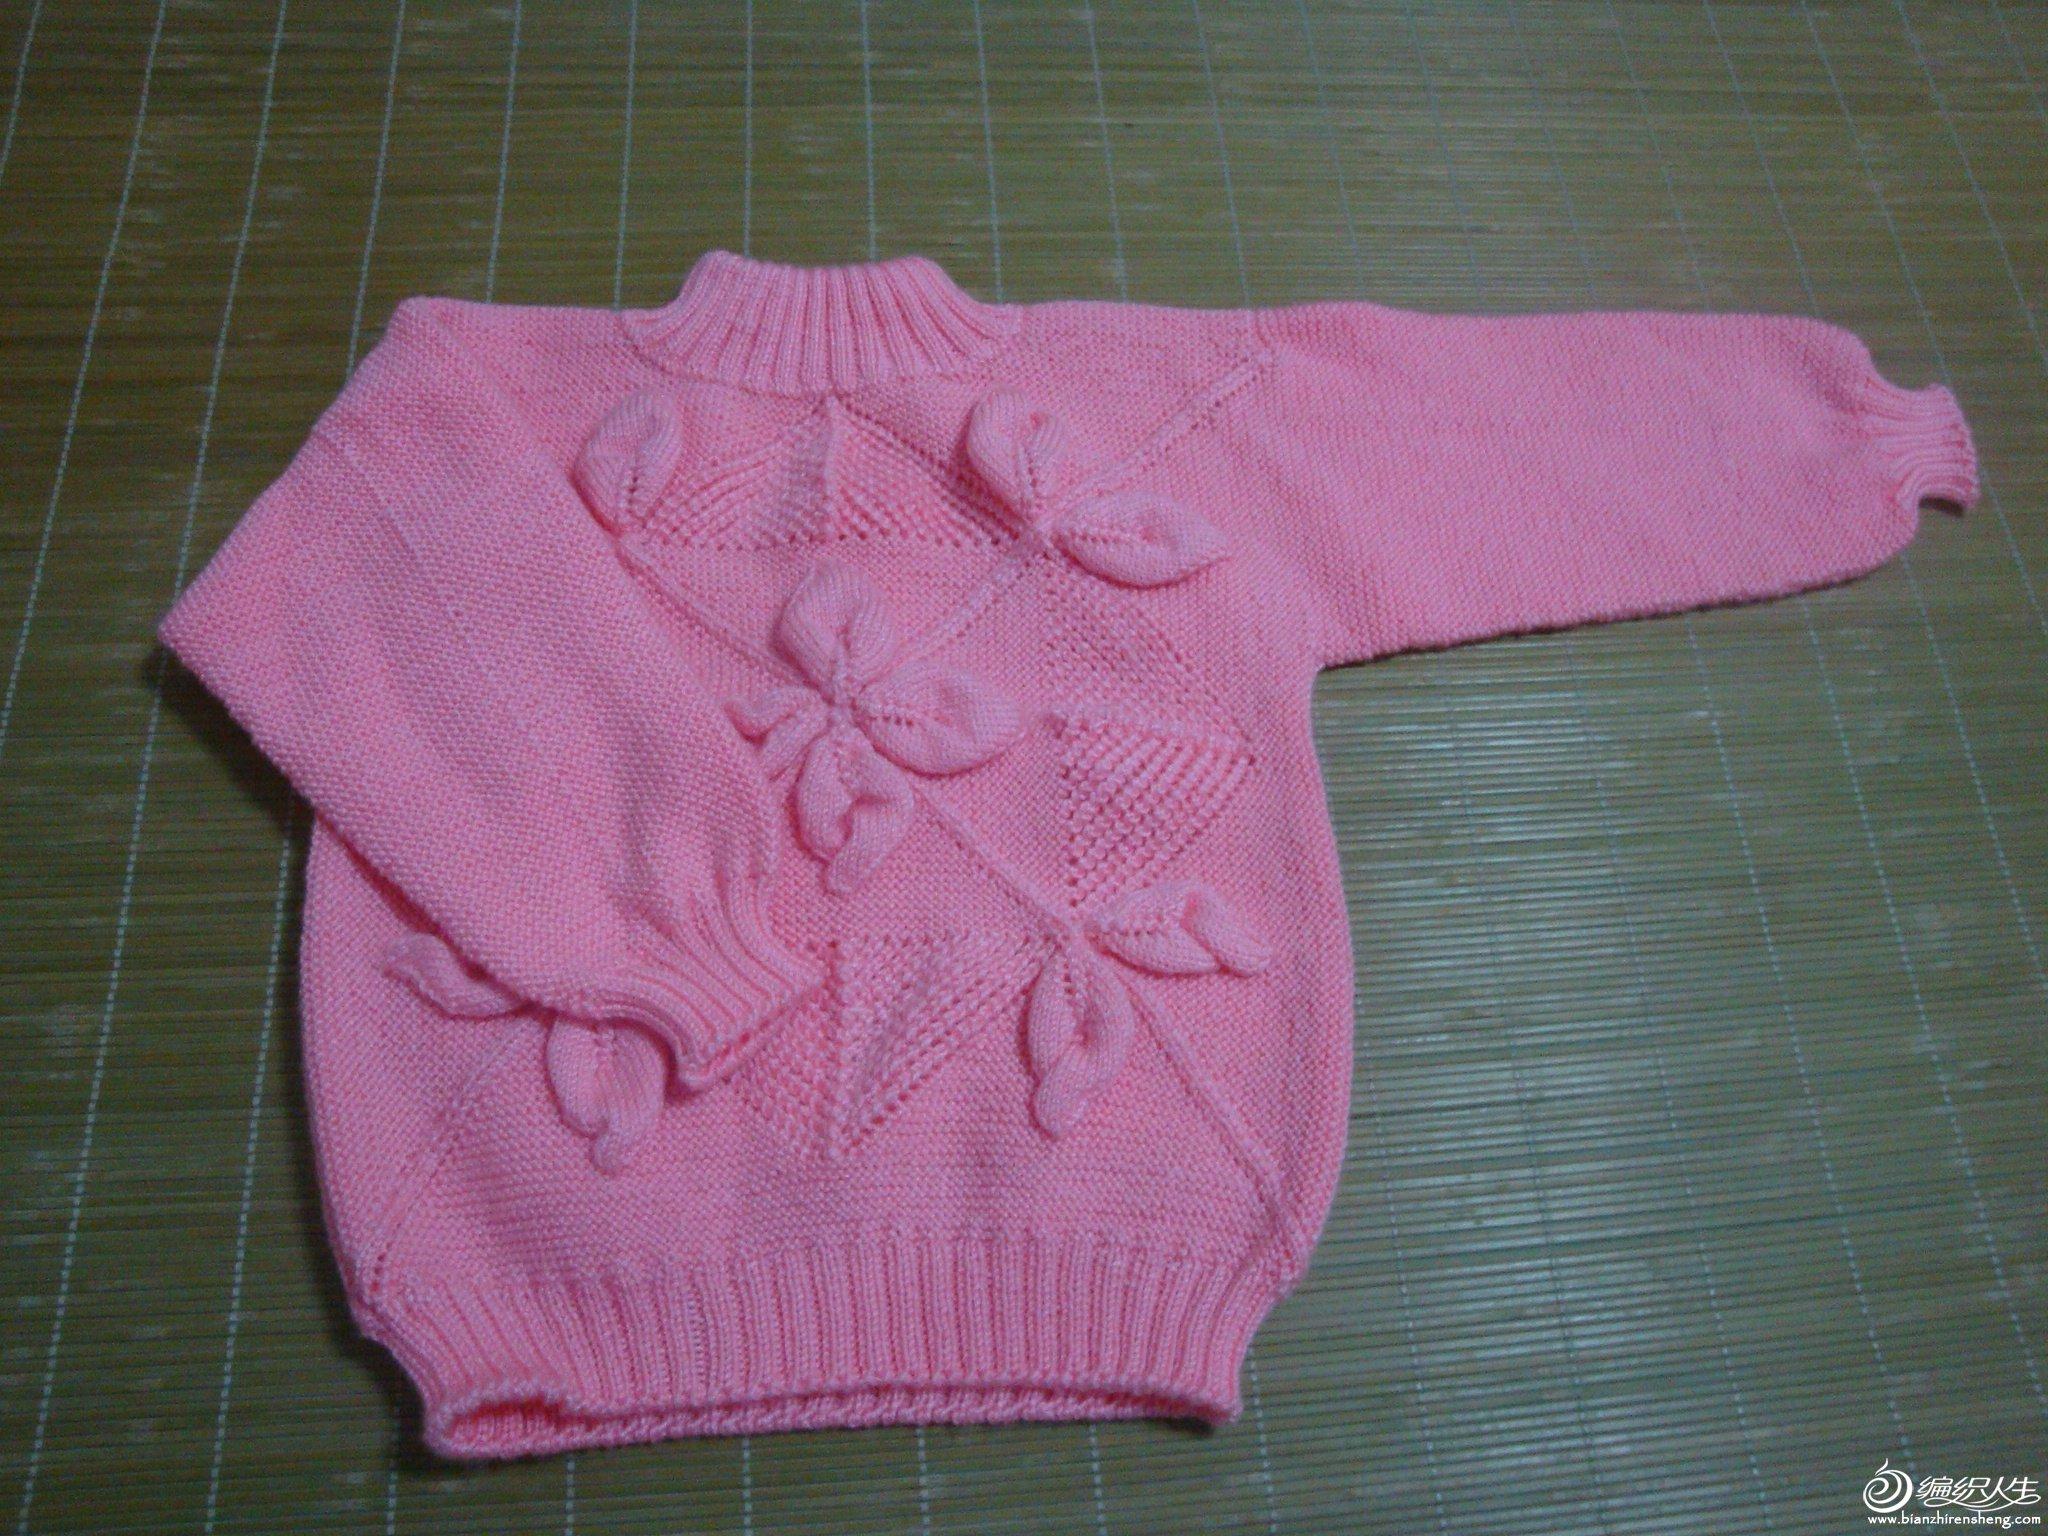 同事织给我女儿的毛衣